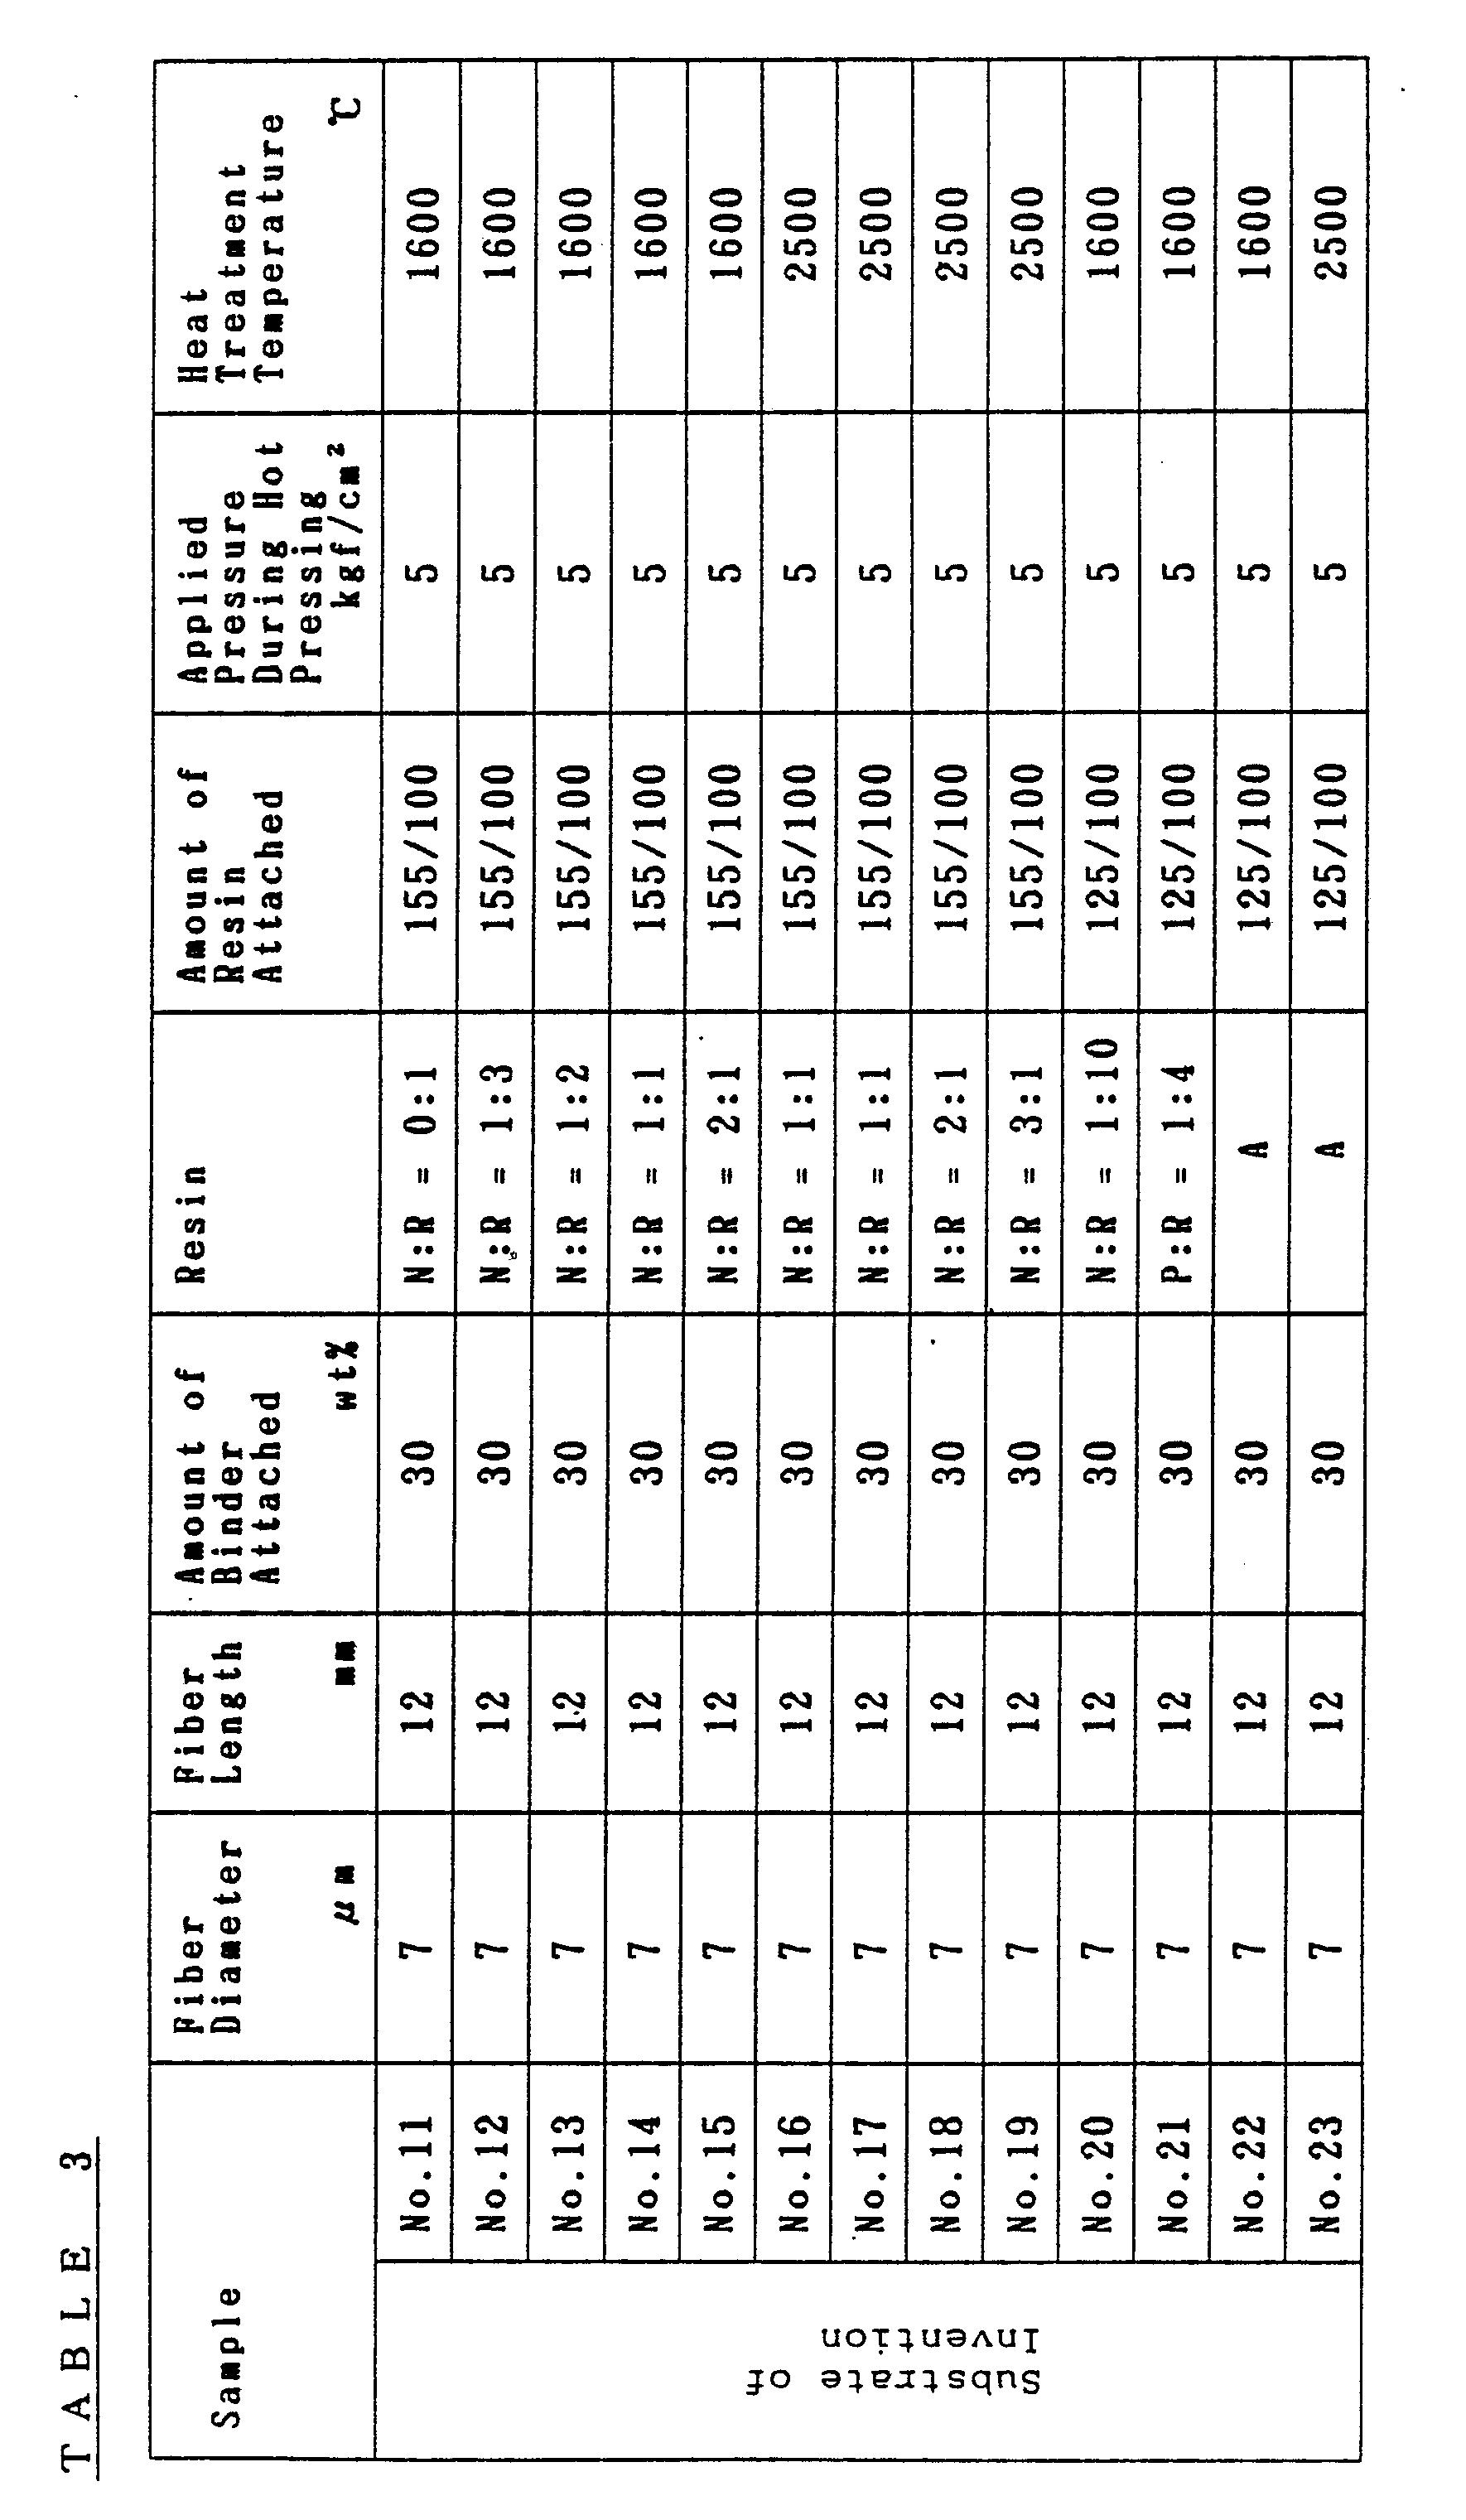 Toray Carbon Fiber Sem Paper | Wiring Diagram Database